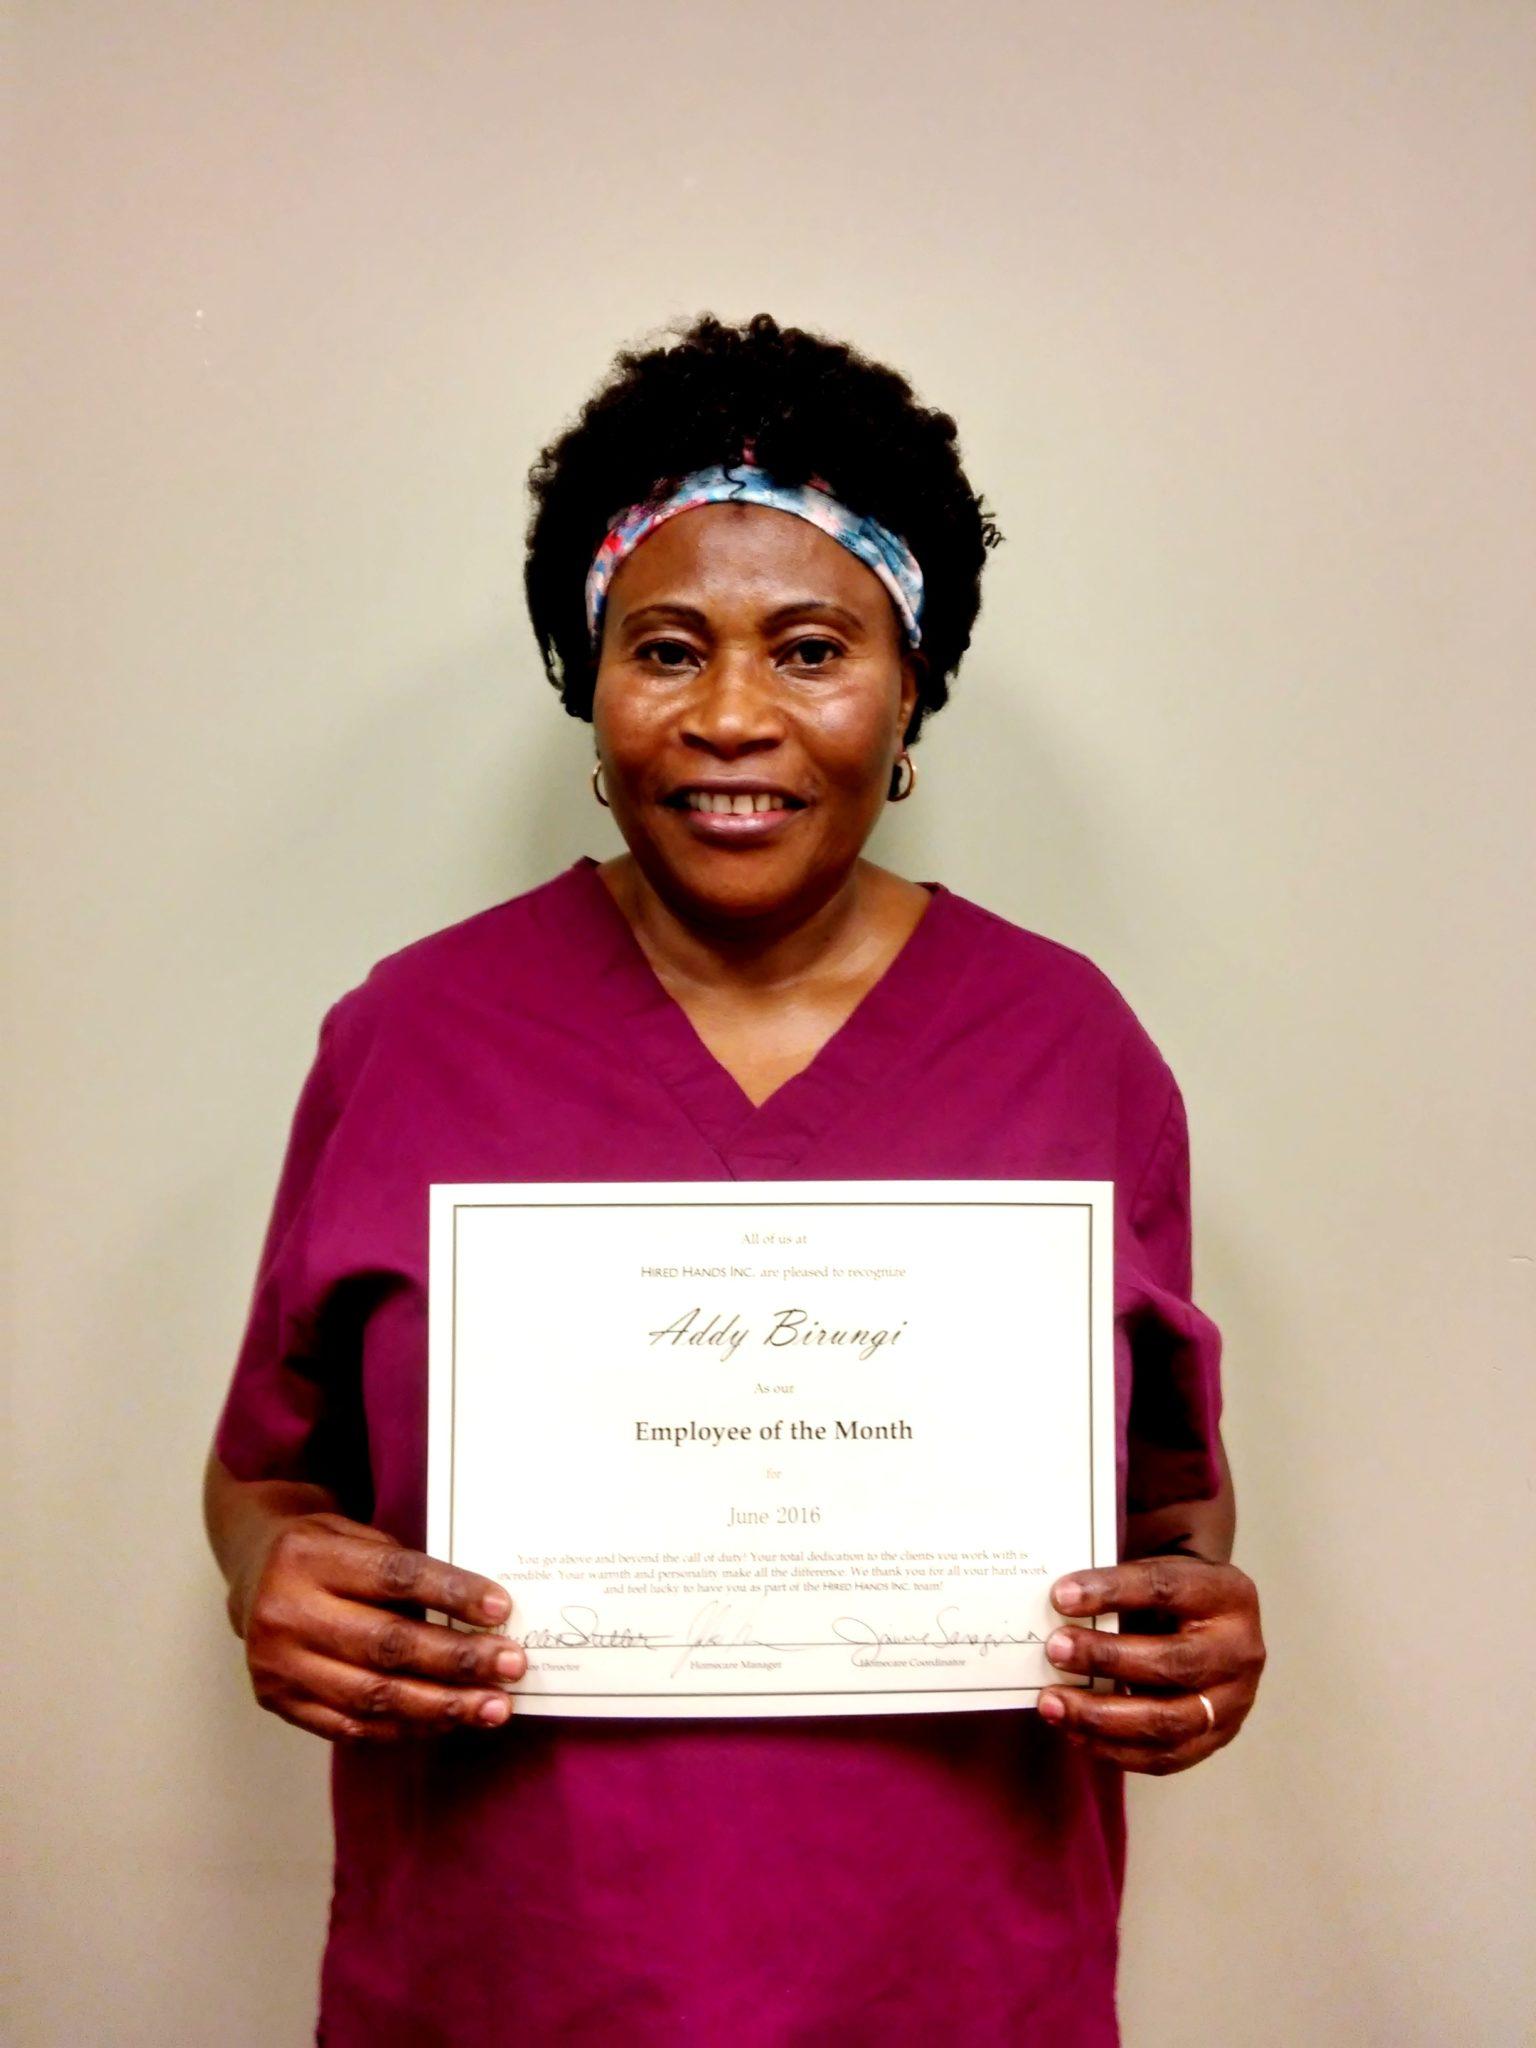 Santa Rosa's Caregiver of the Month